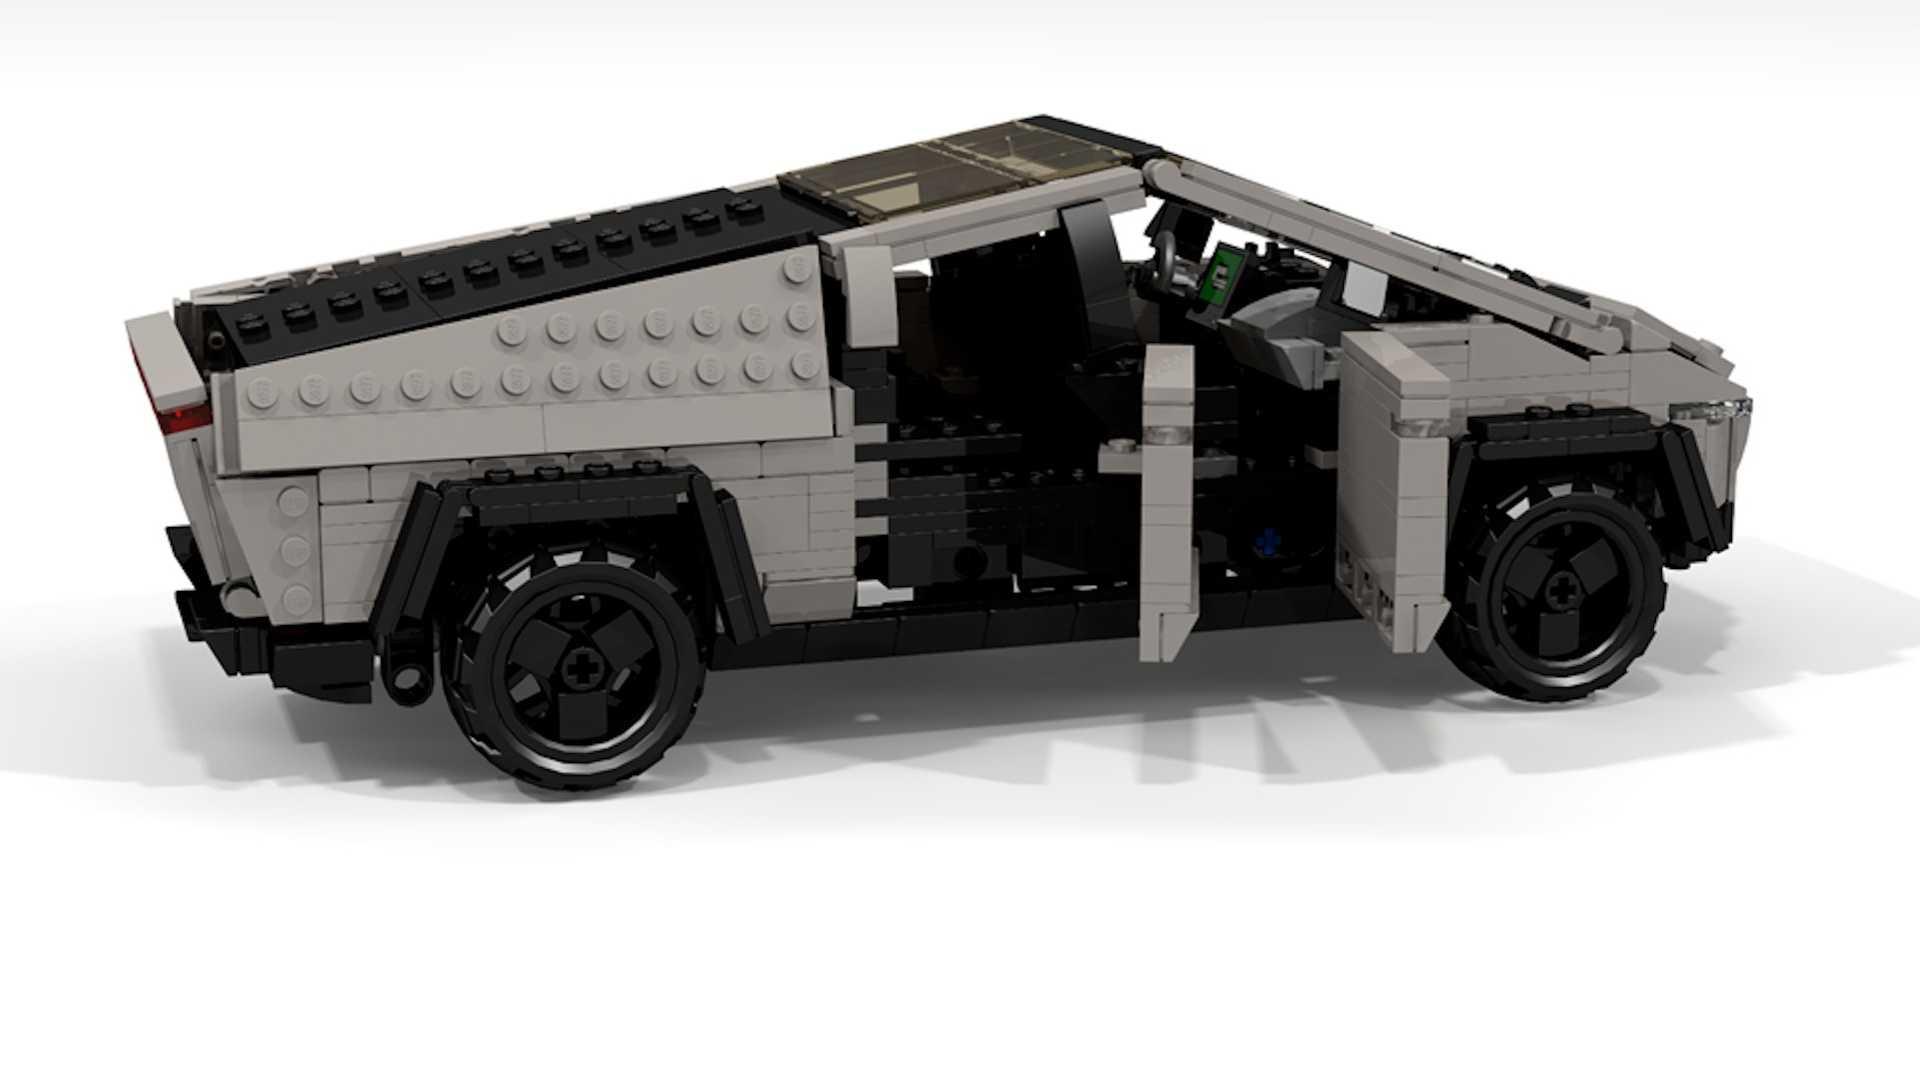 Tesla-Cybertruck-Lego-8